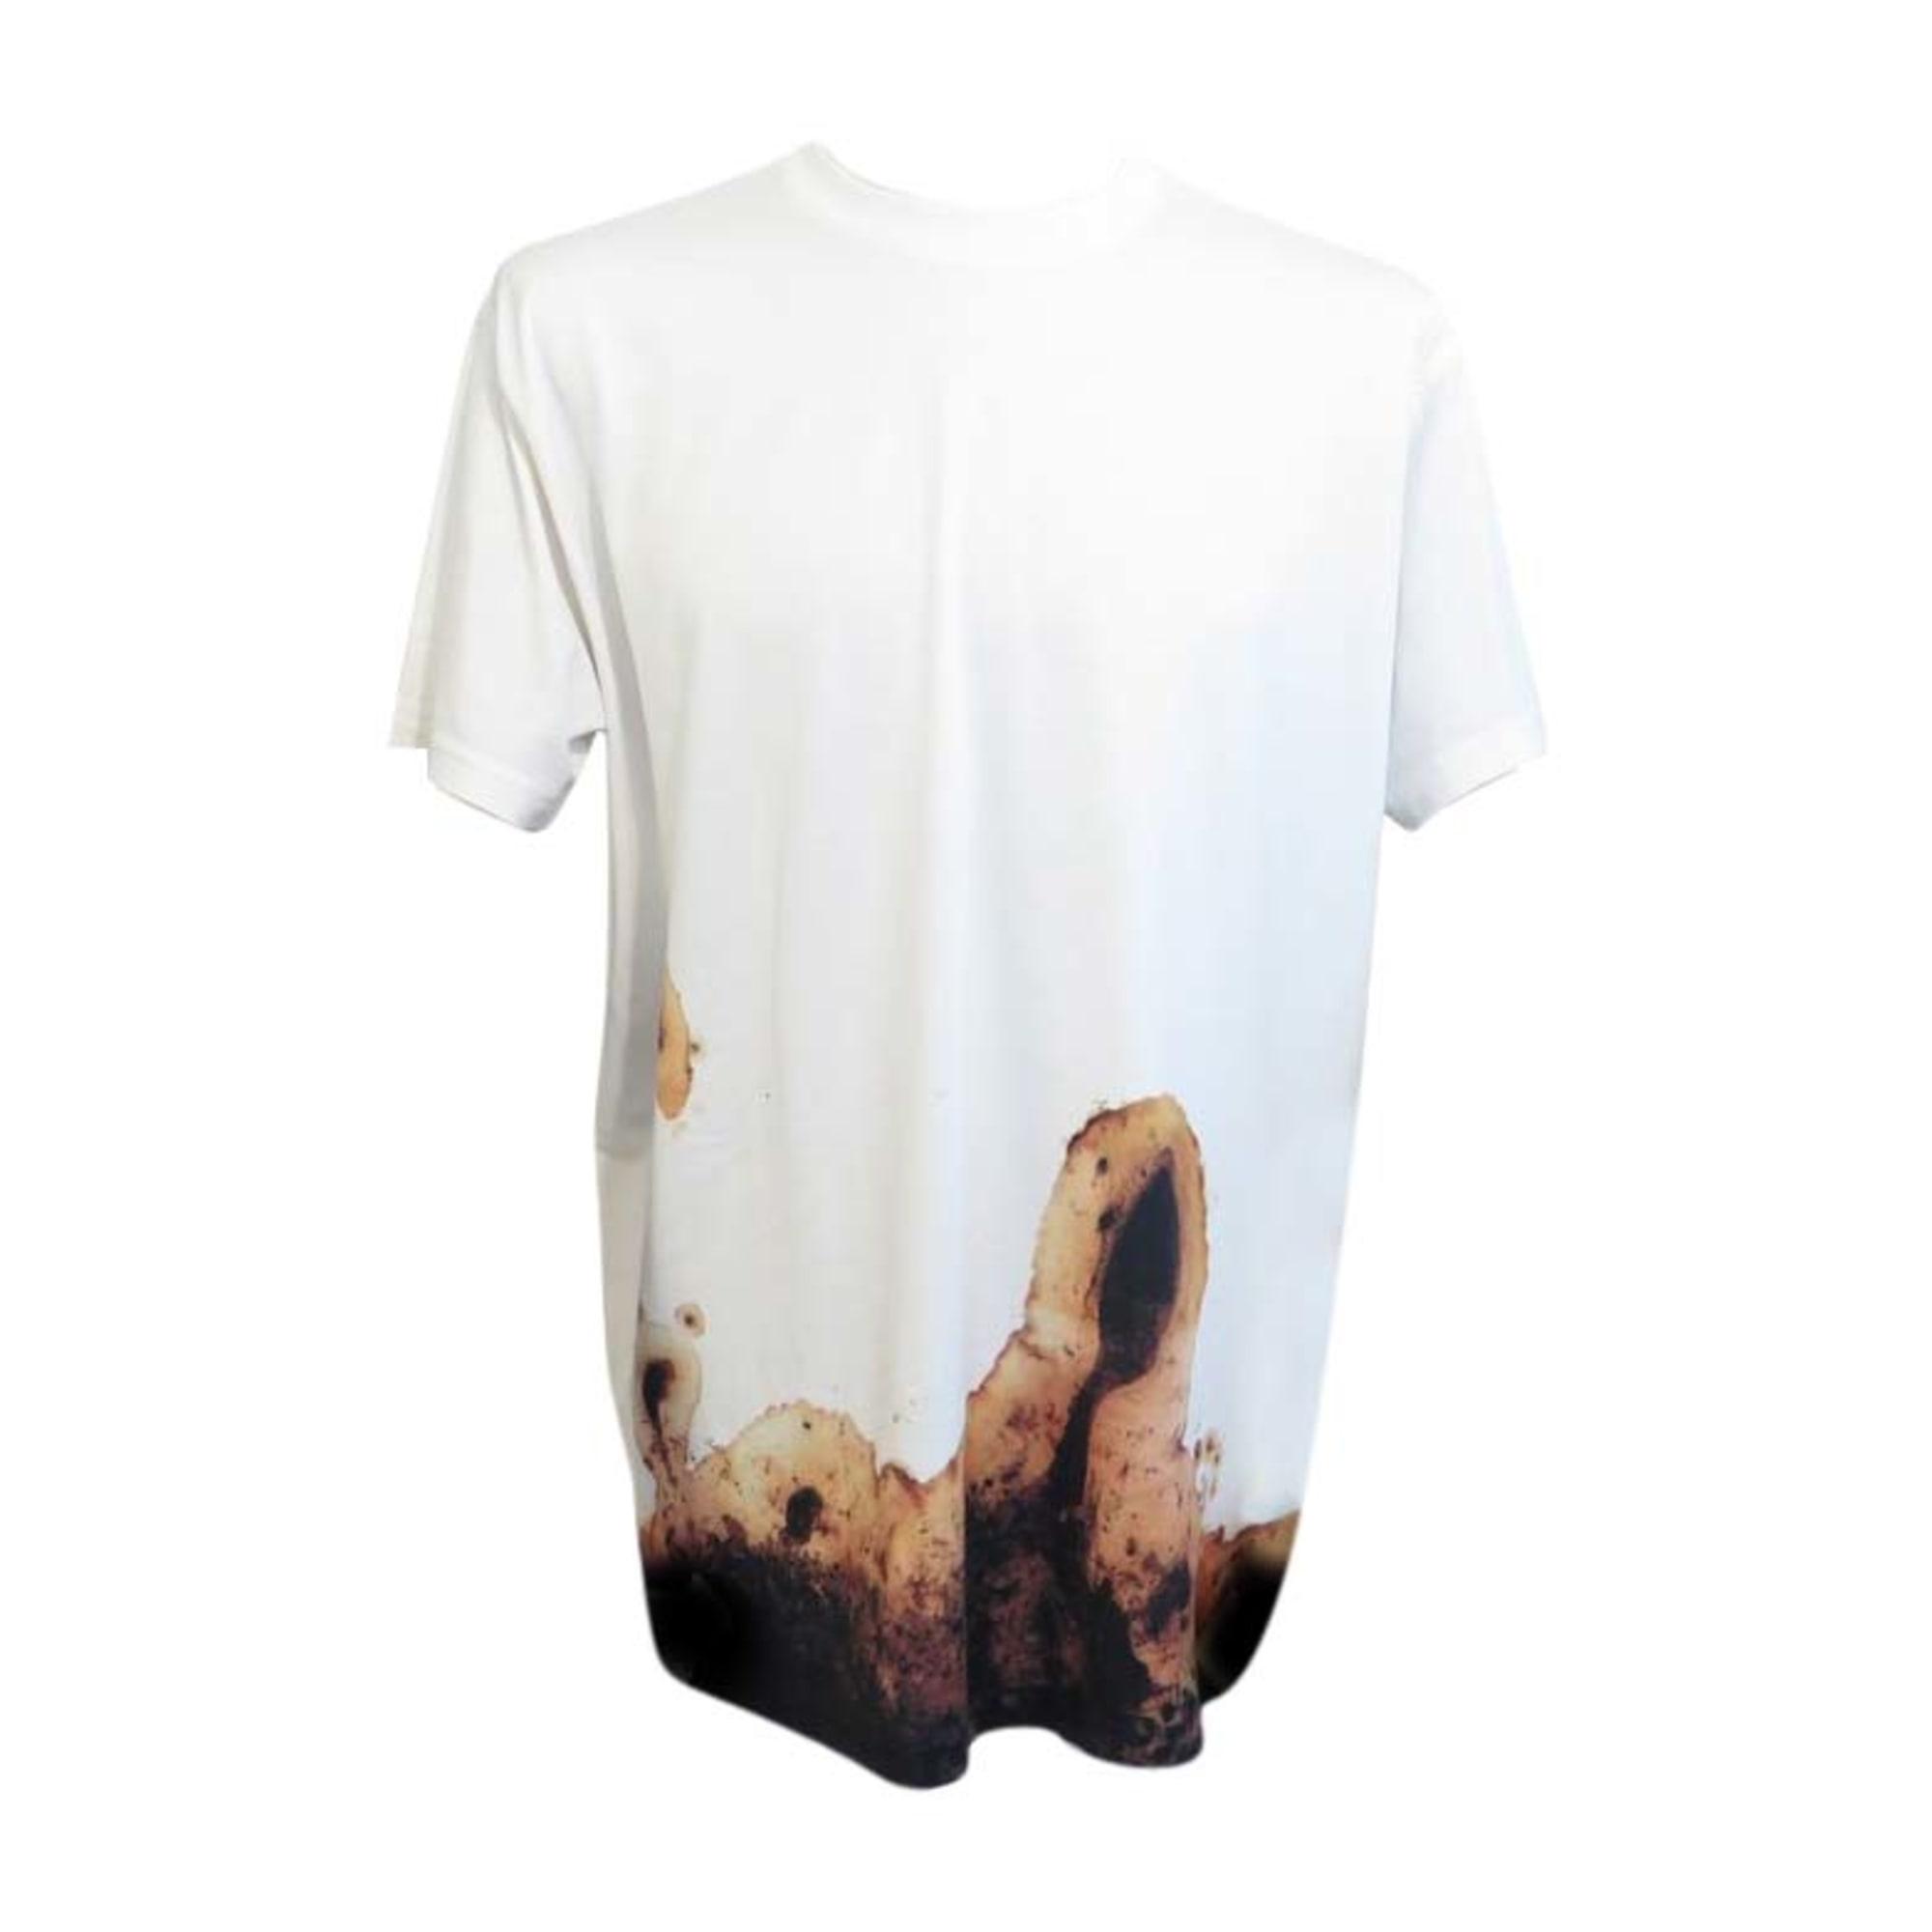 Tee-shirt GIVENCHY 1 (S) blanc vendu par Encherexpert - paris14 ... d2aa7687115